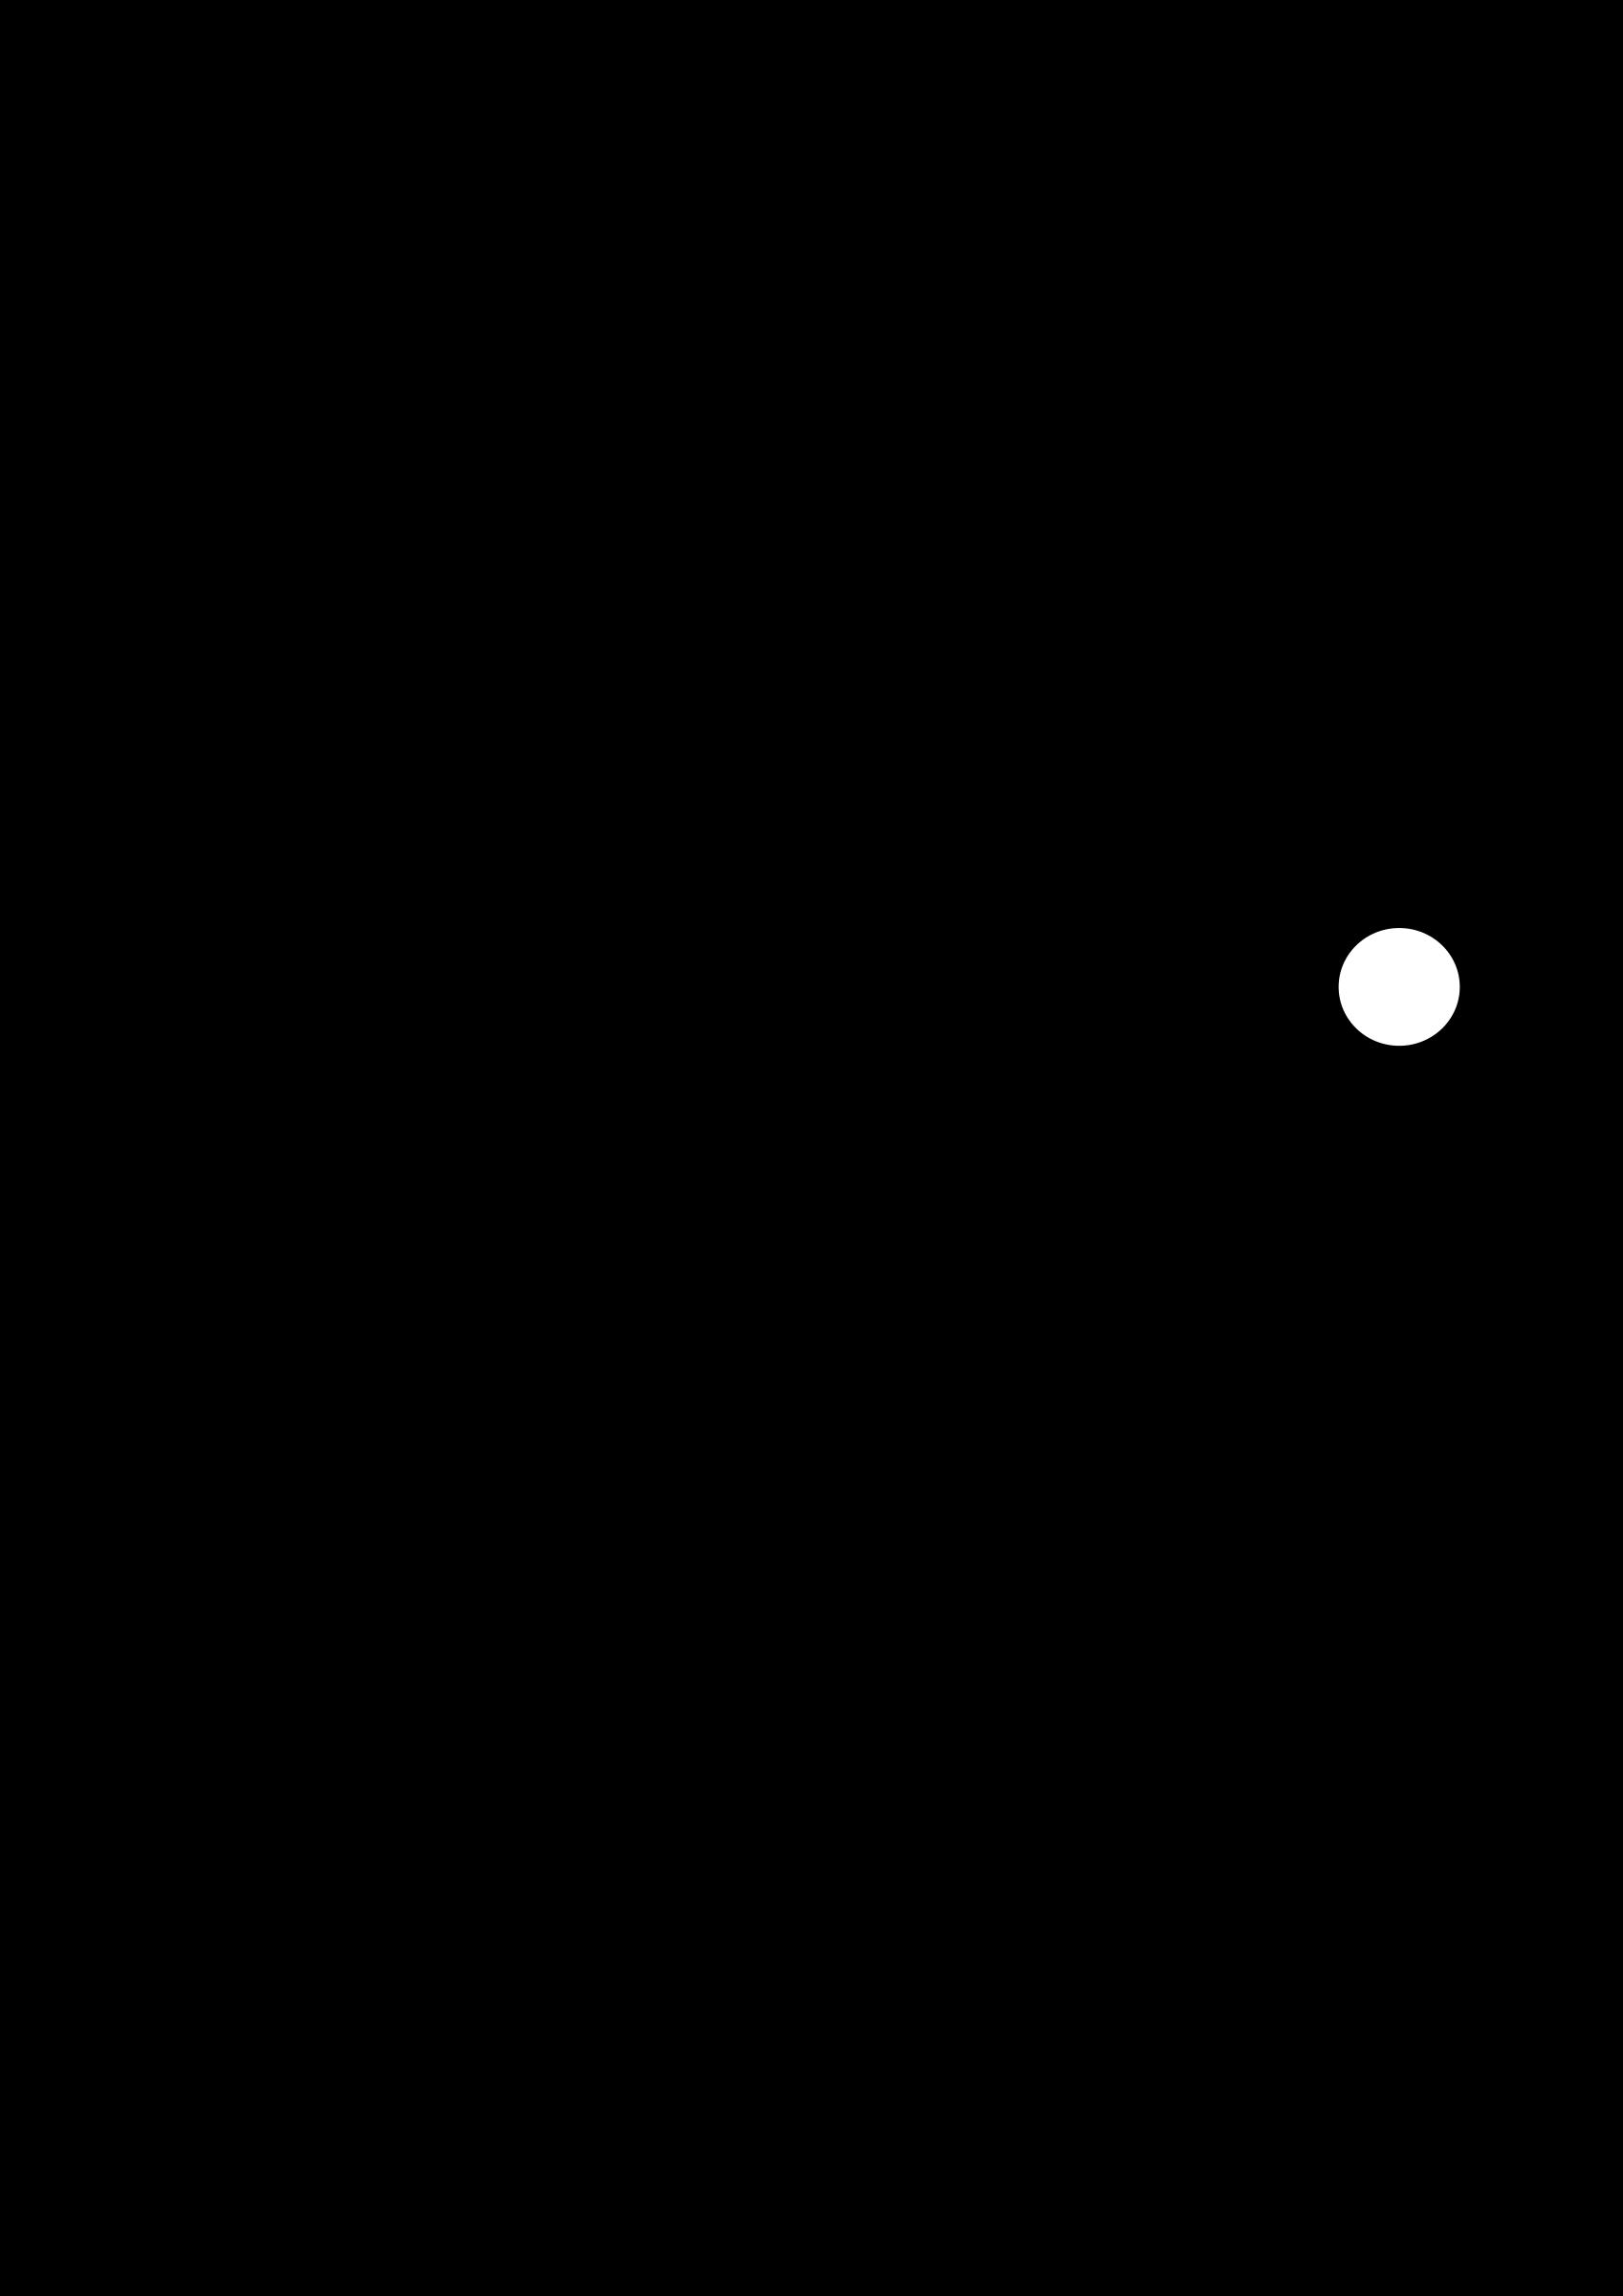 Microscope Clipart Png 7-microscope clipart png 7-10